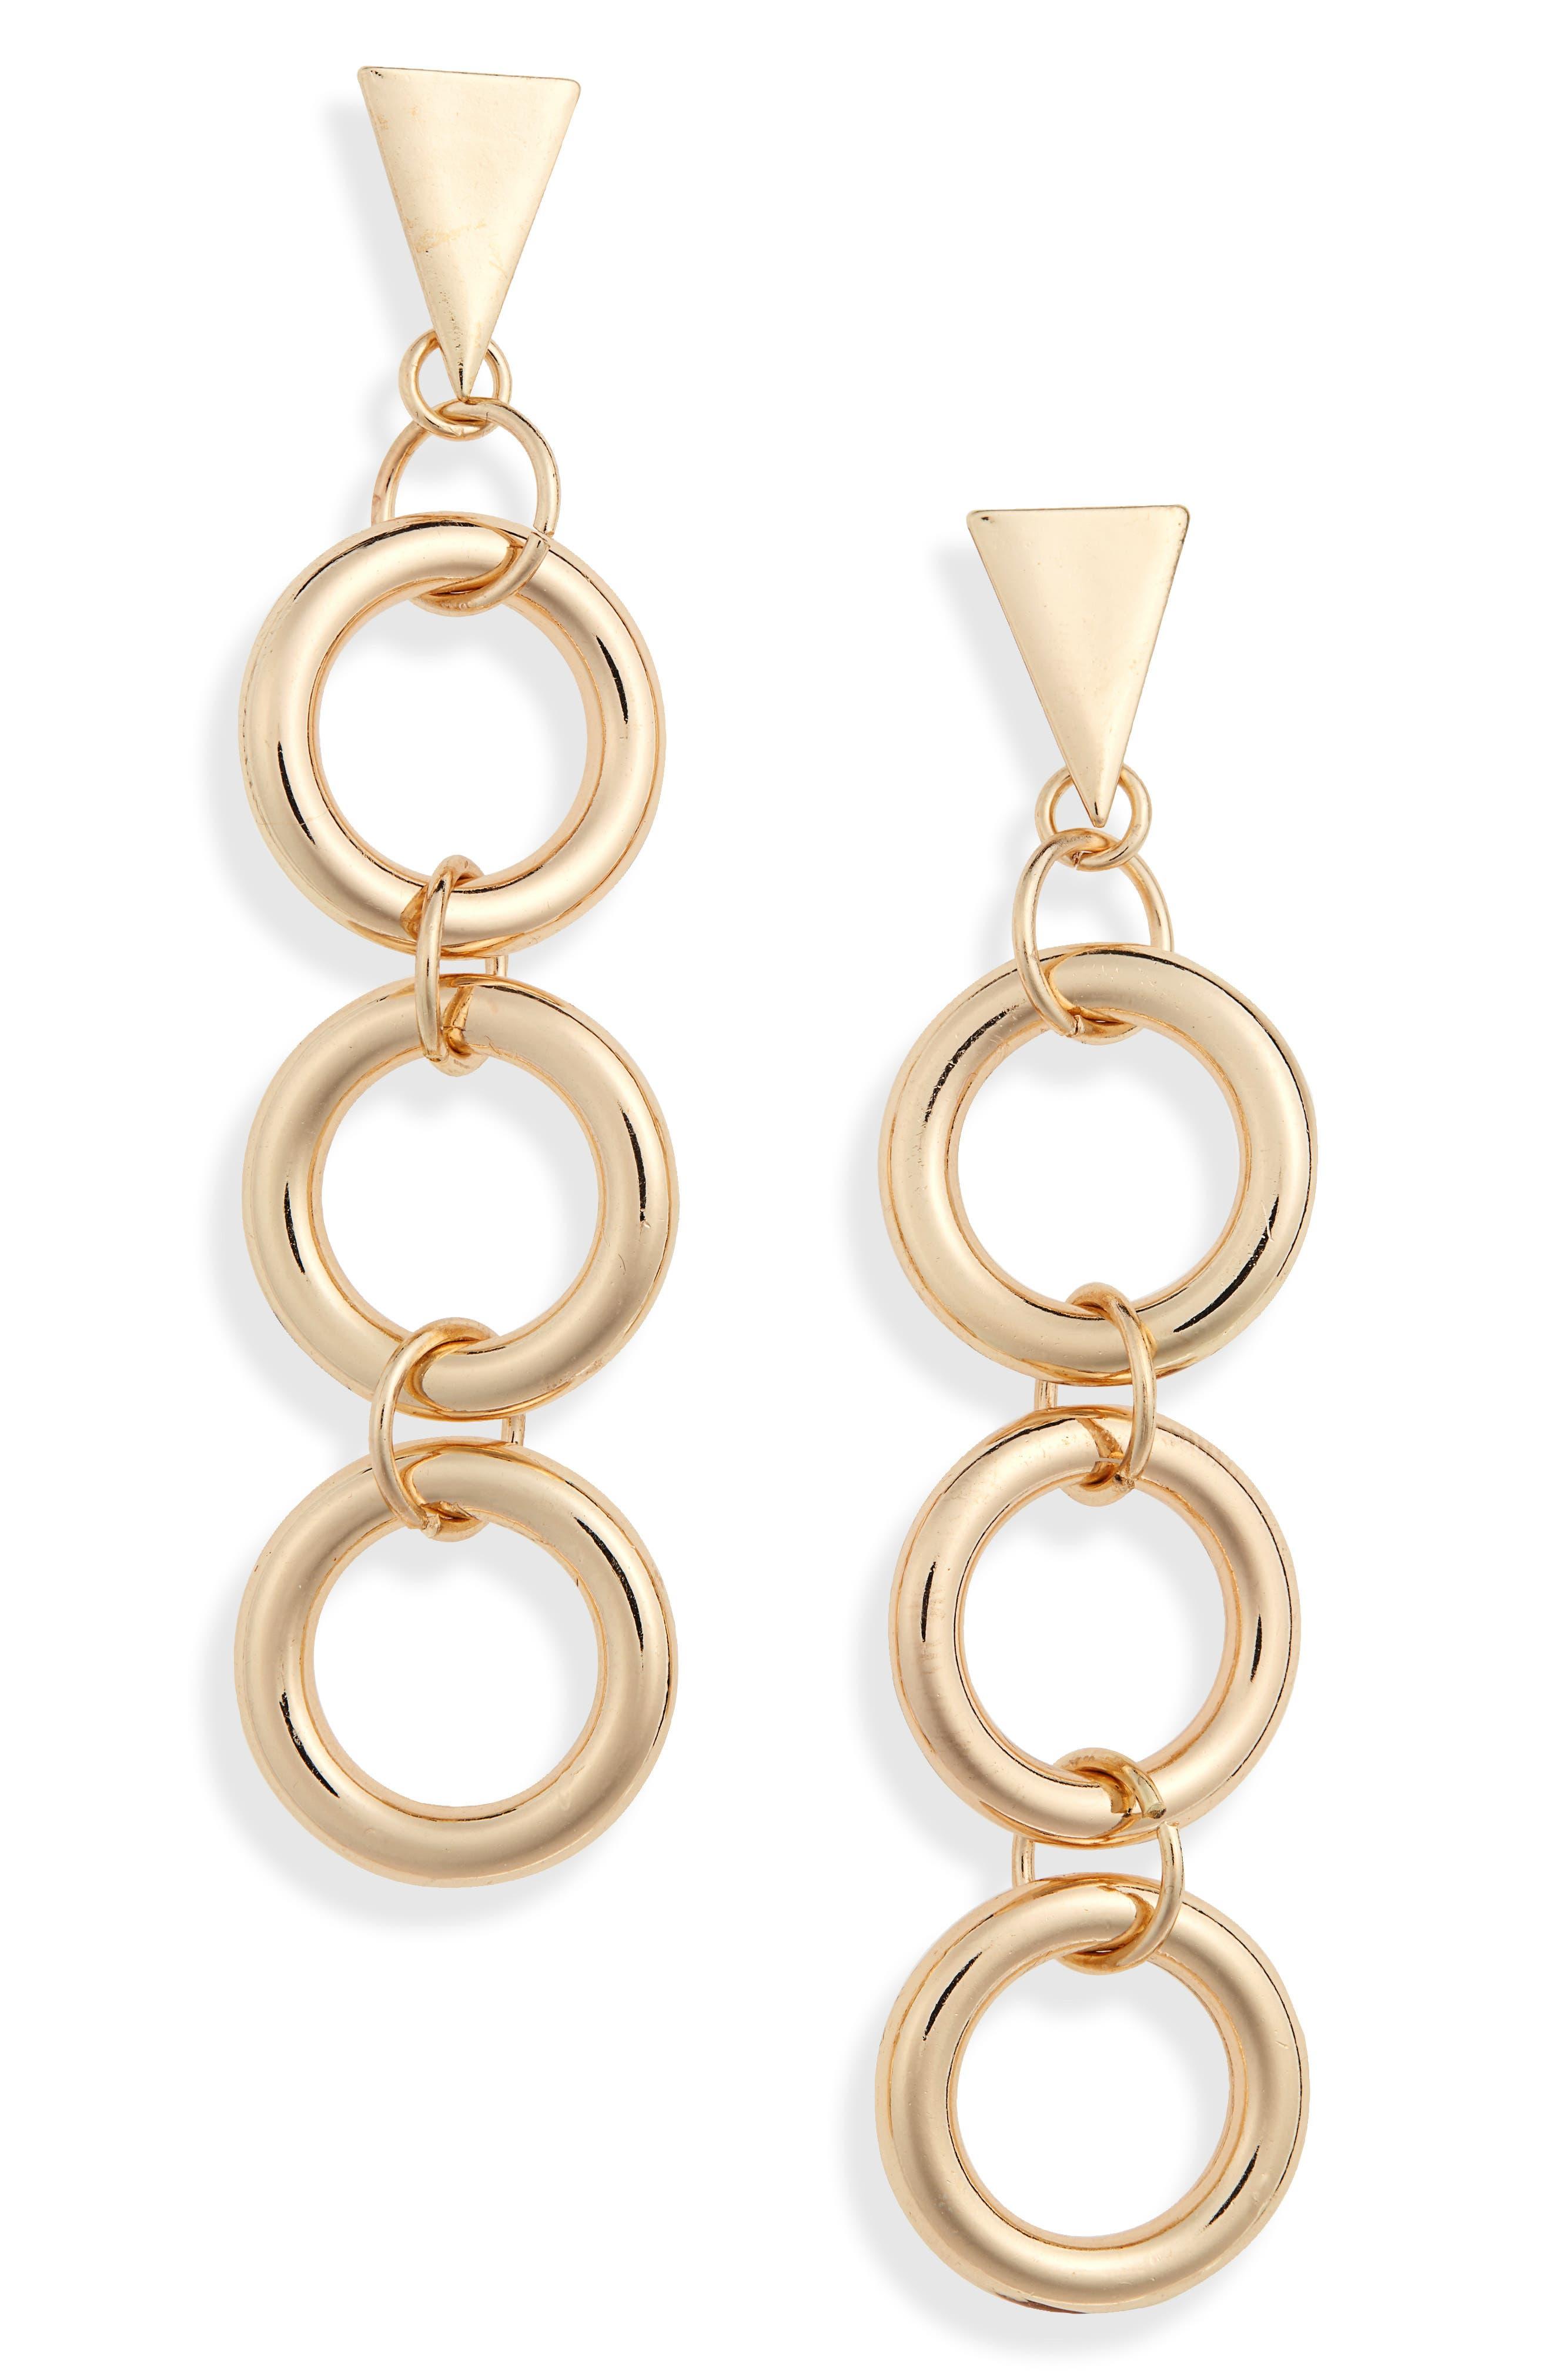 Chainlink Drop Earrings,                             Main thumbnail 1, color,                             GOLD